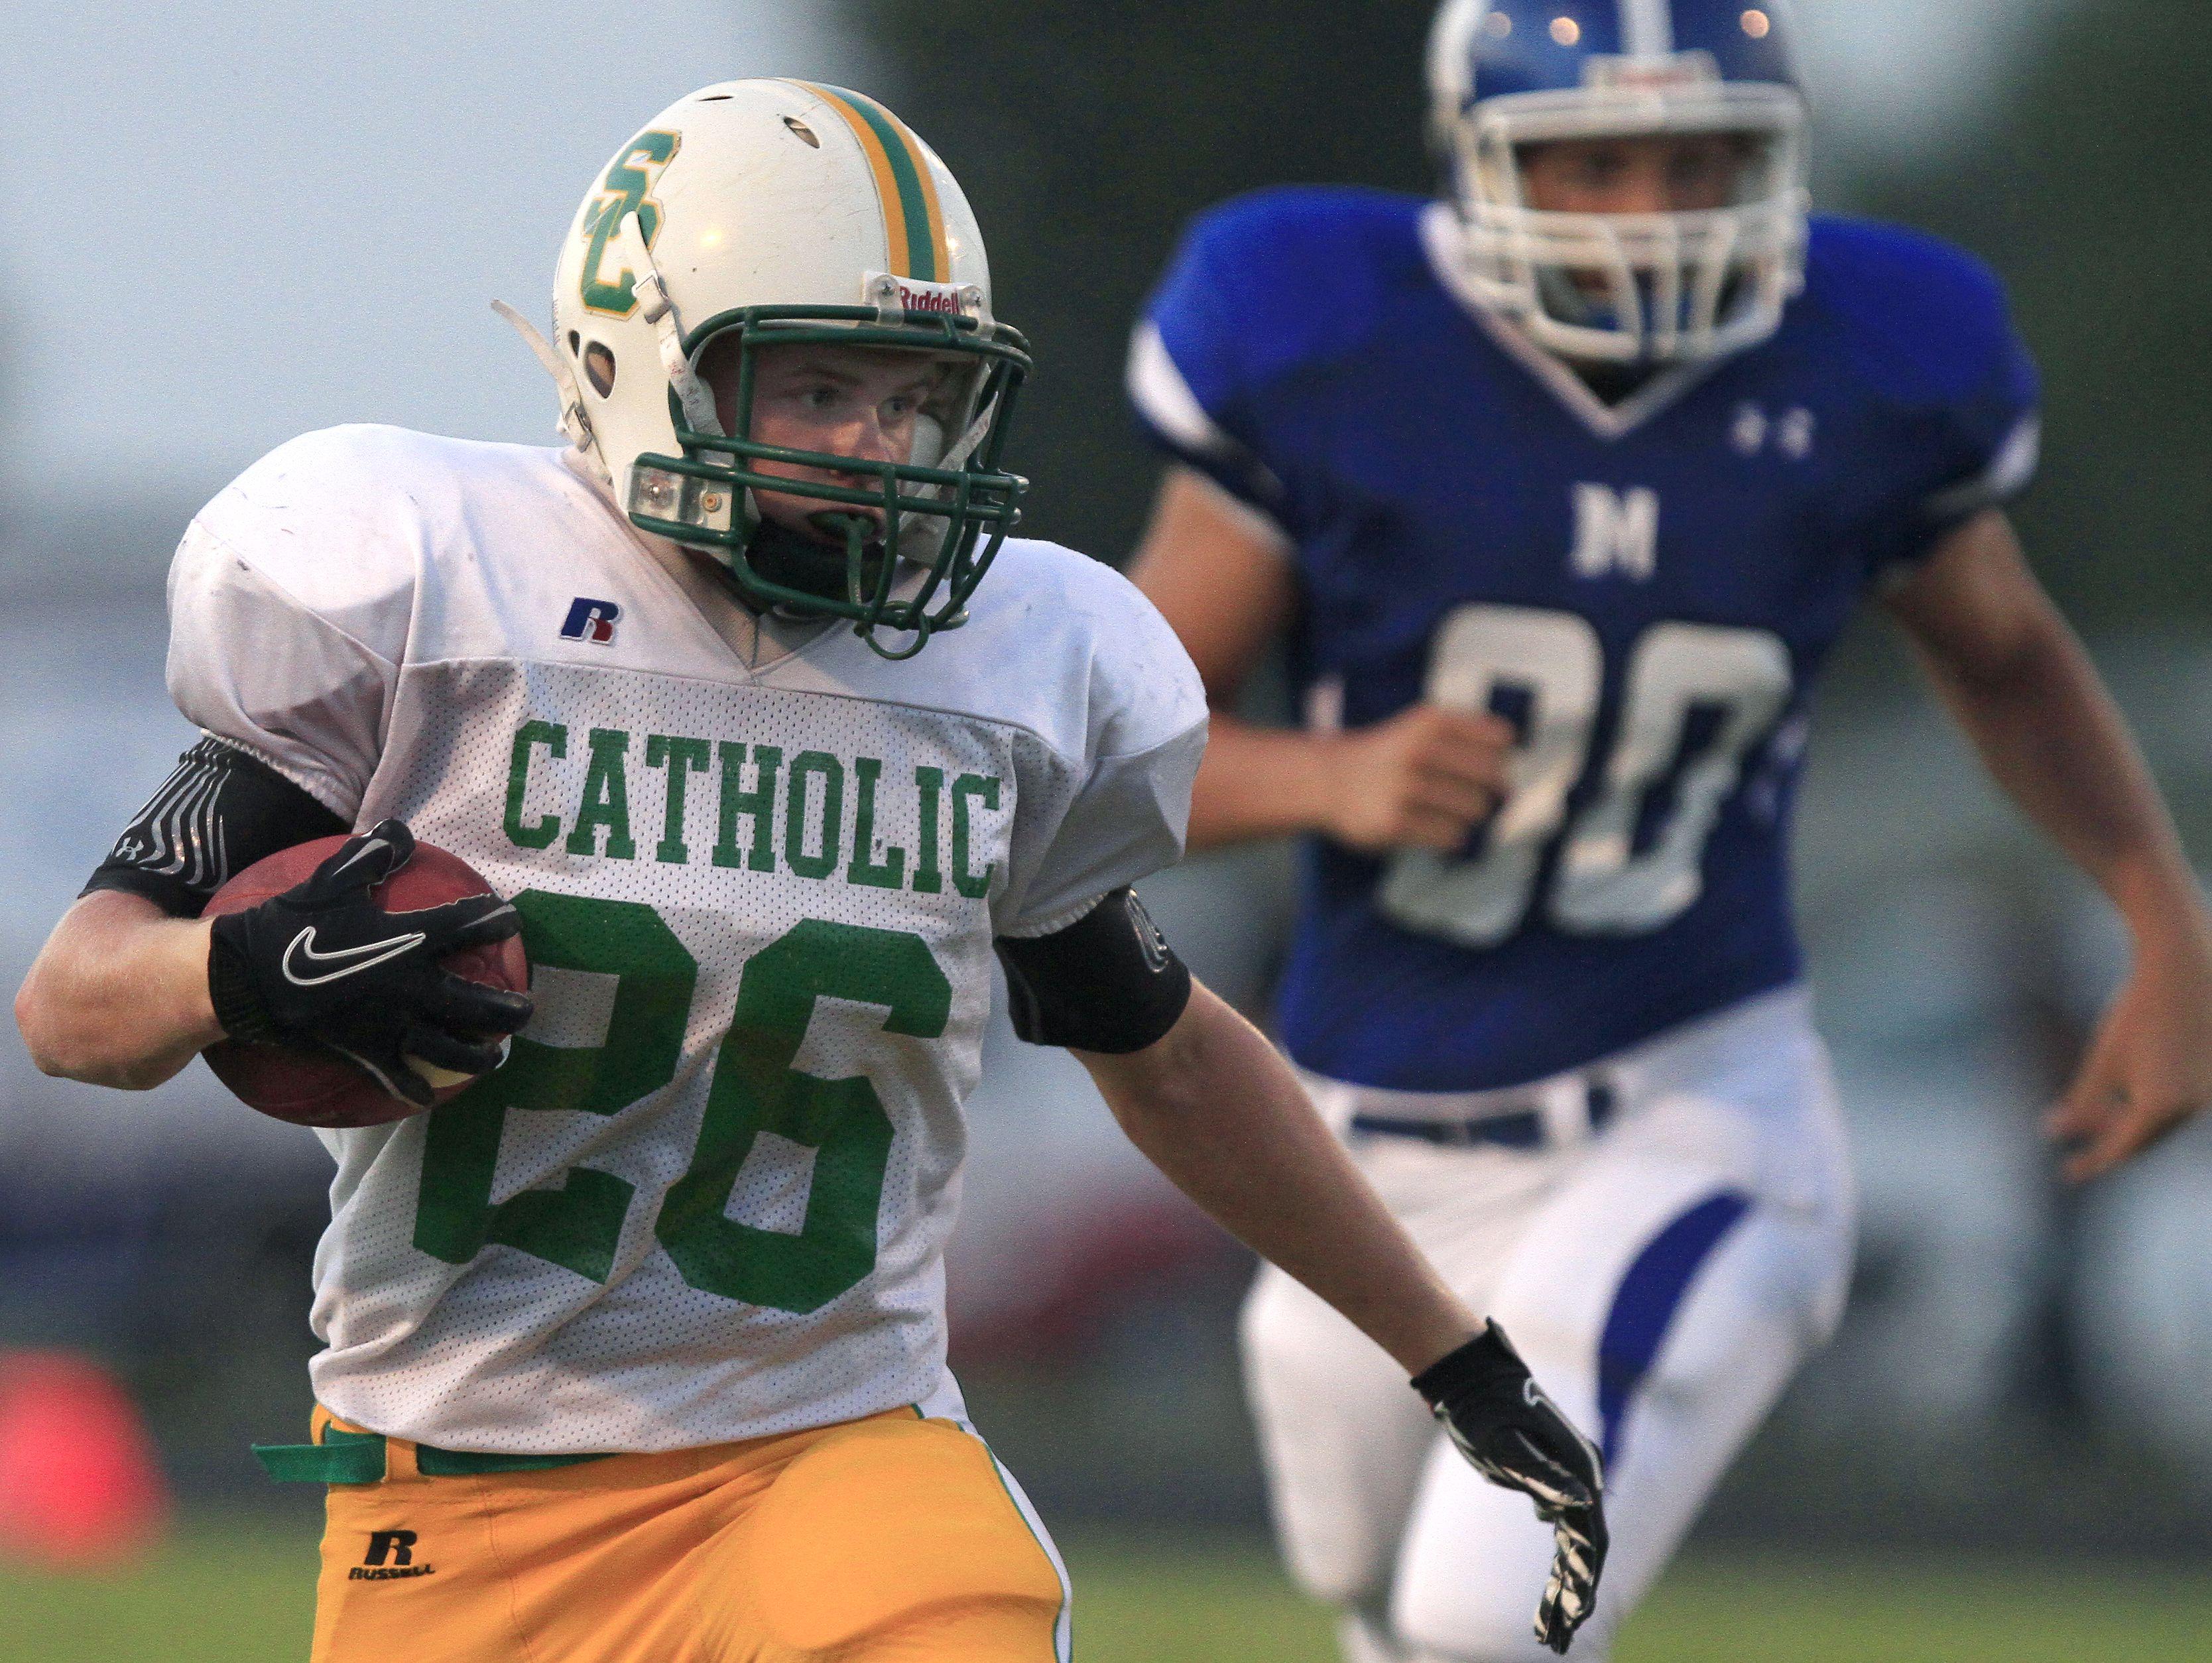 Marshfield vs. Catholic football at Marshfield on Friday, September 2, 2011. Nathan Papes/News-Leader